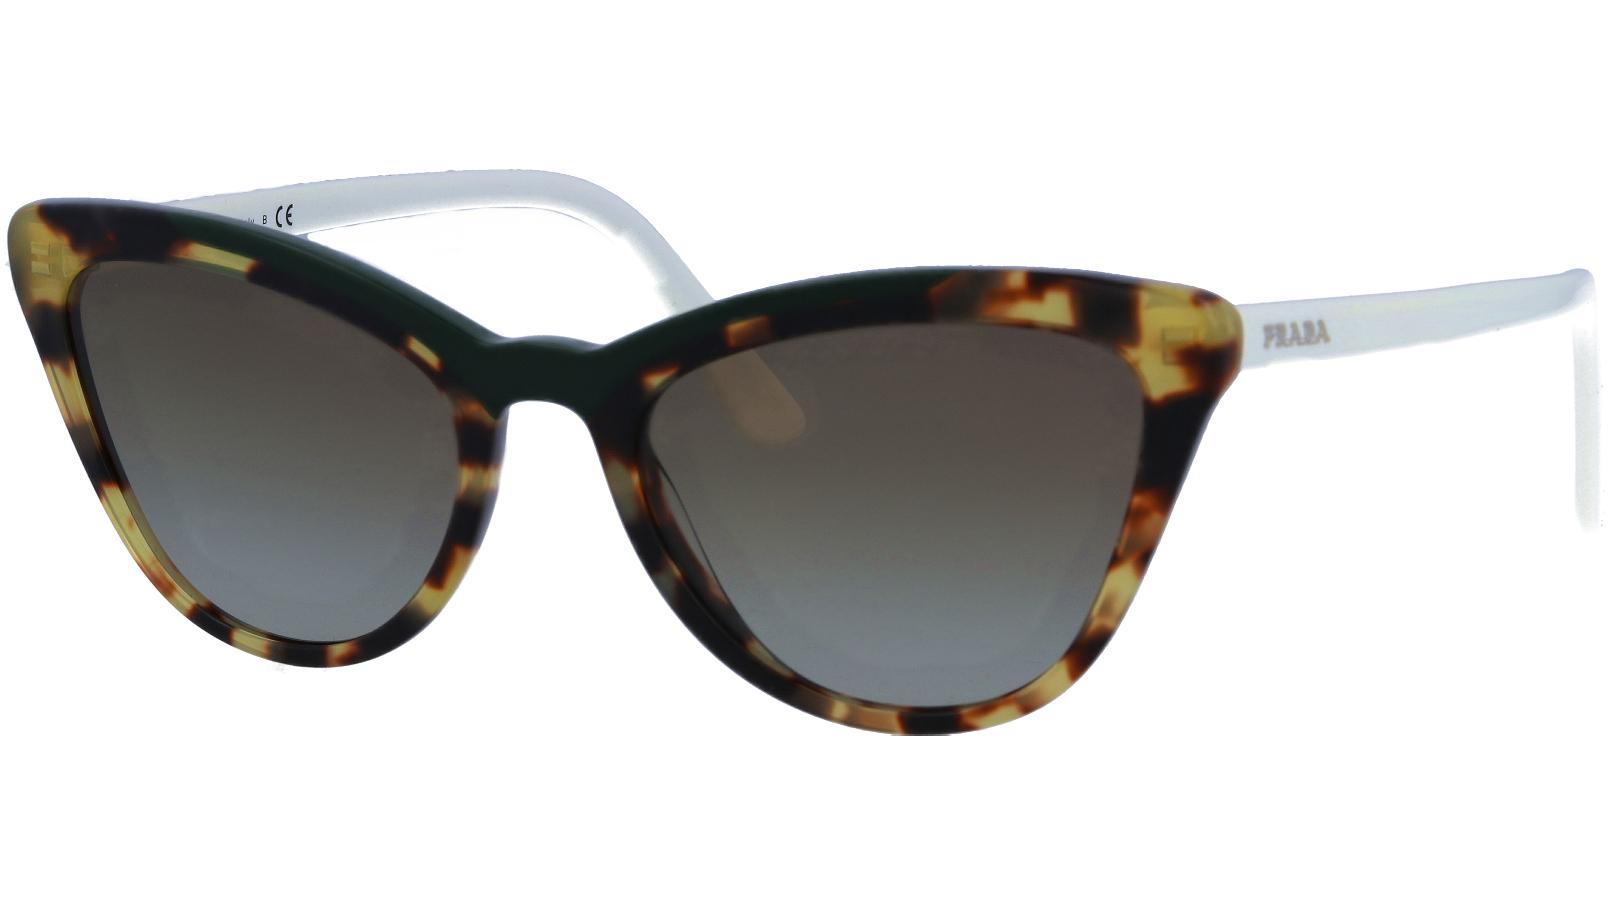 PRADA PR01VS 3215O2 56 HAVANAV Sunglasses